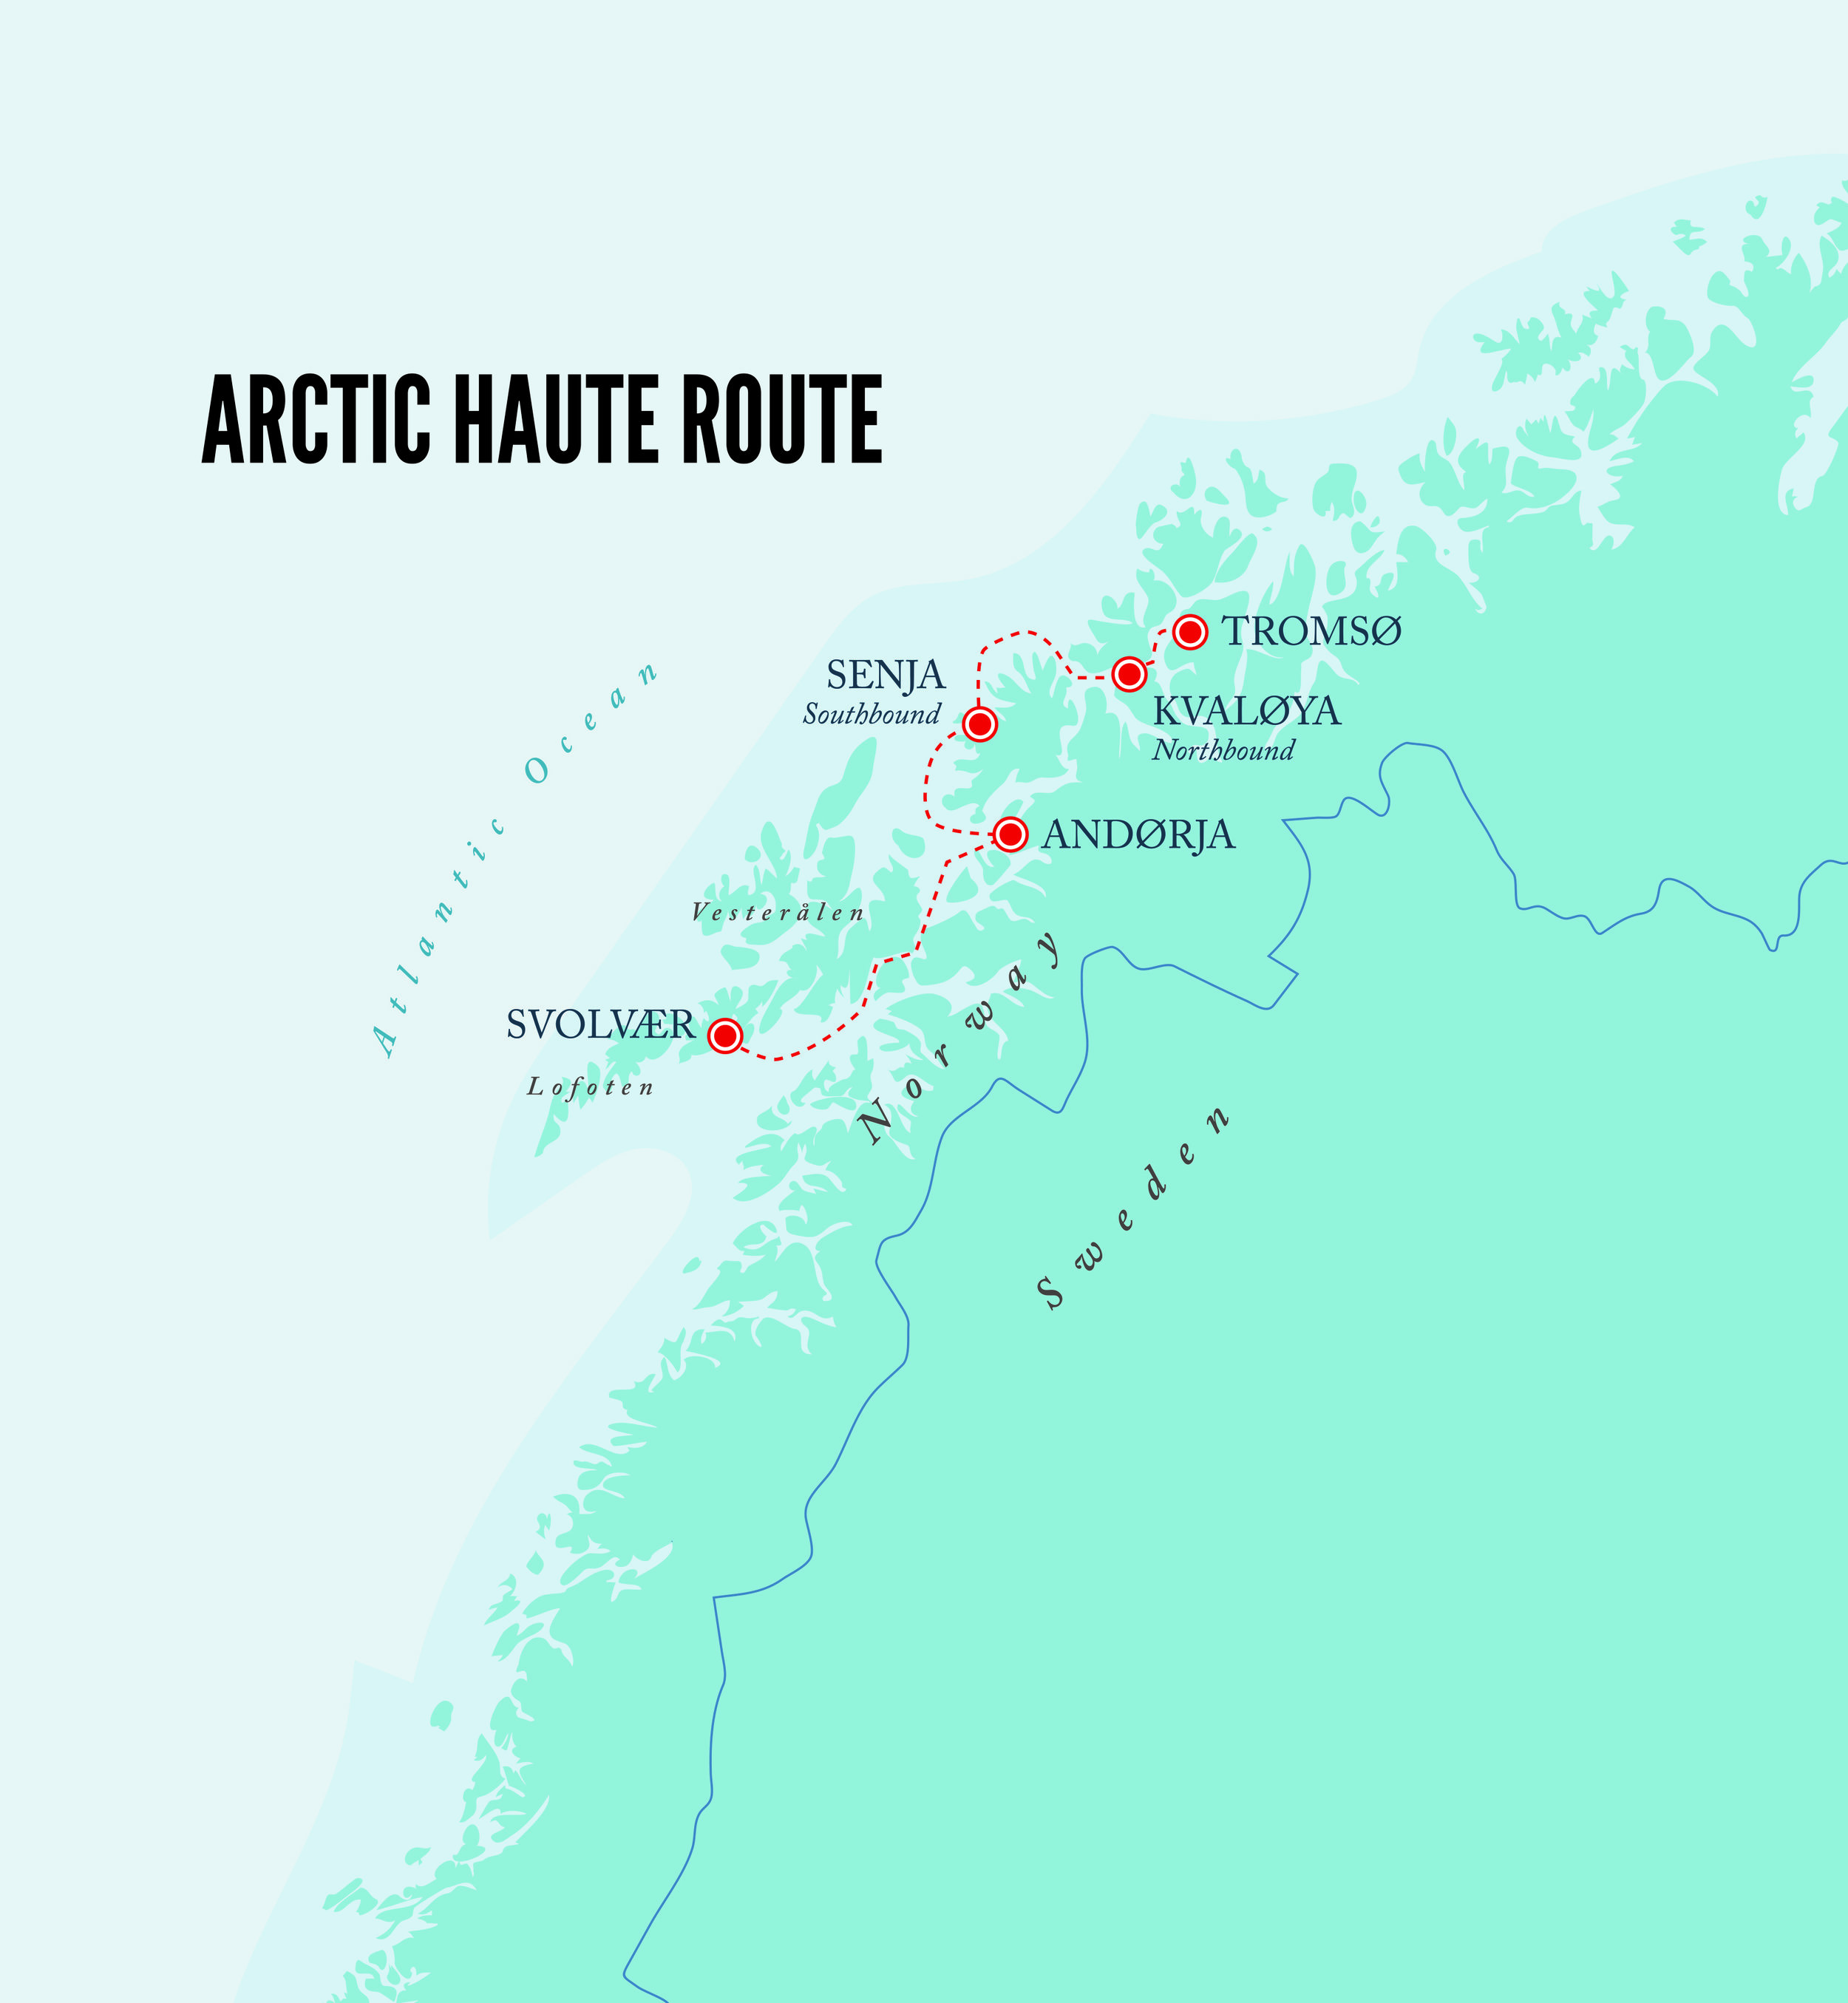 Norwegian Adventure Company_Kart Arctic Haute Route(003).jpg